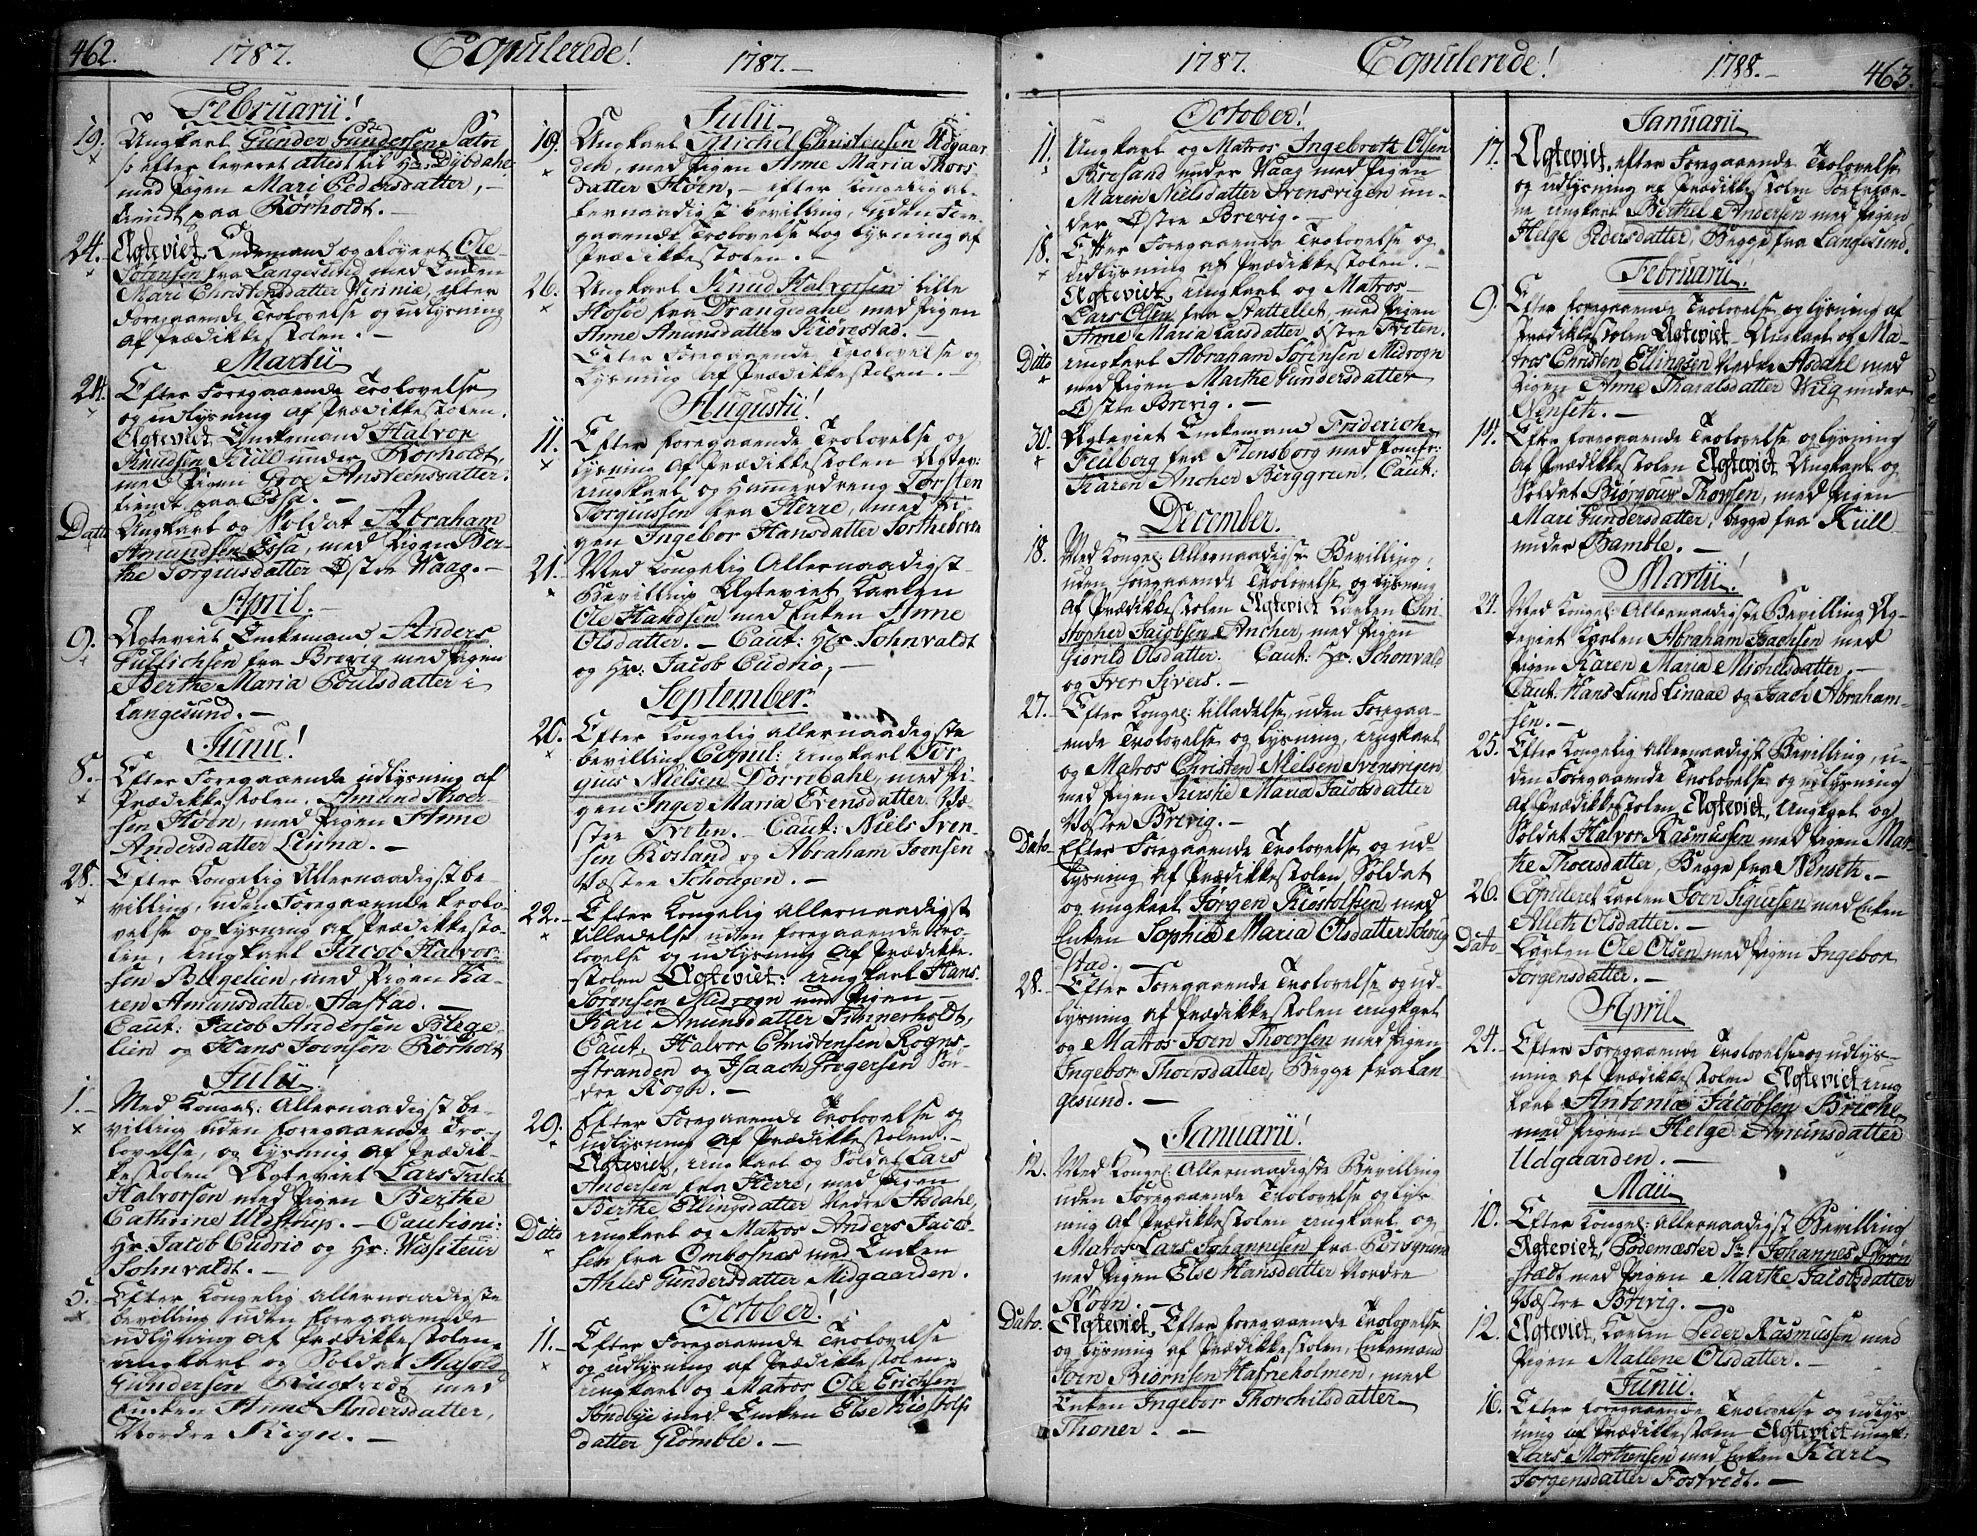 SAKO, Bamble kirkebøker, F/Fa/L0002: Ministerialbok nr. I 2, 1775-1814, s. 462-463